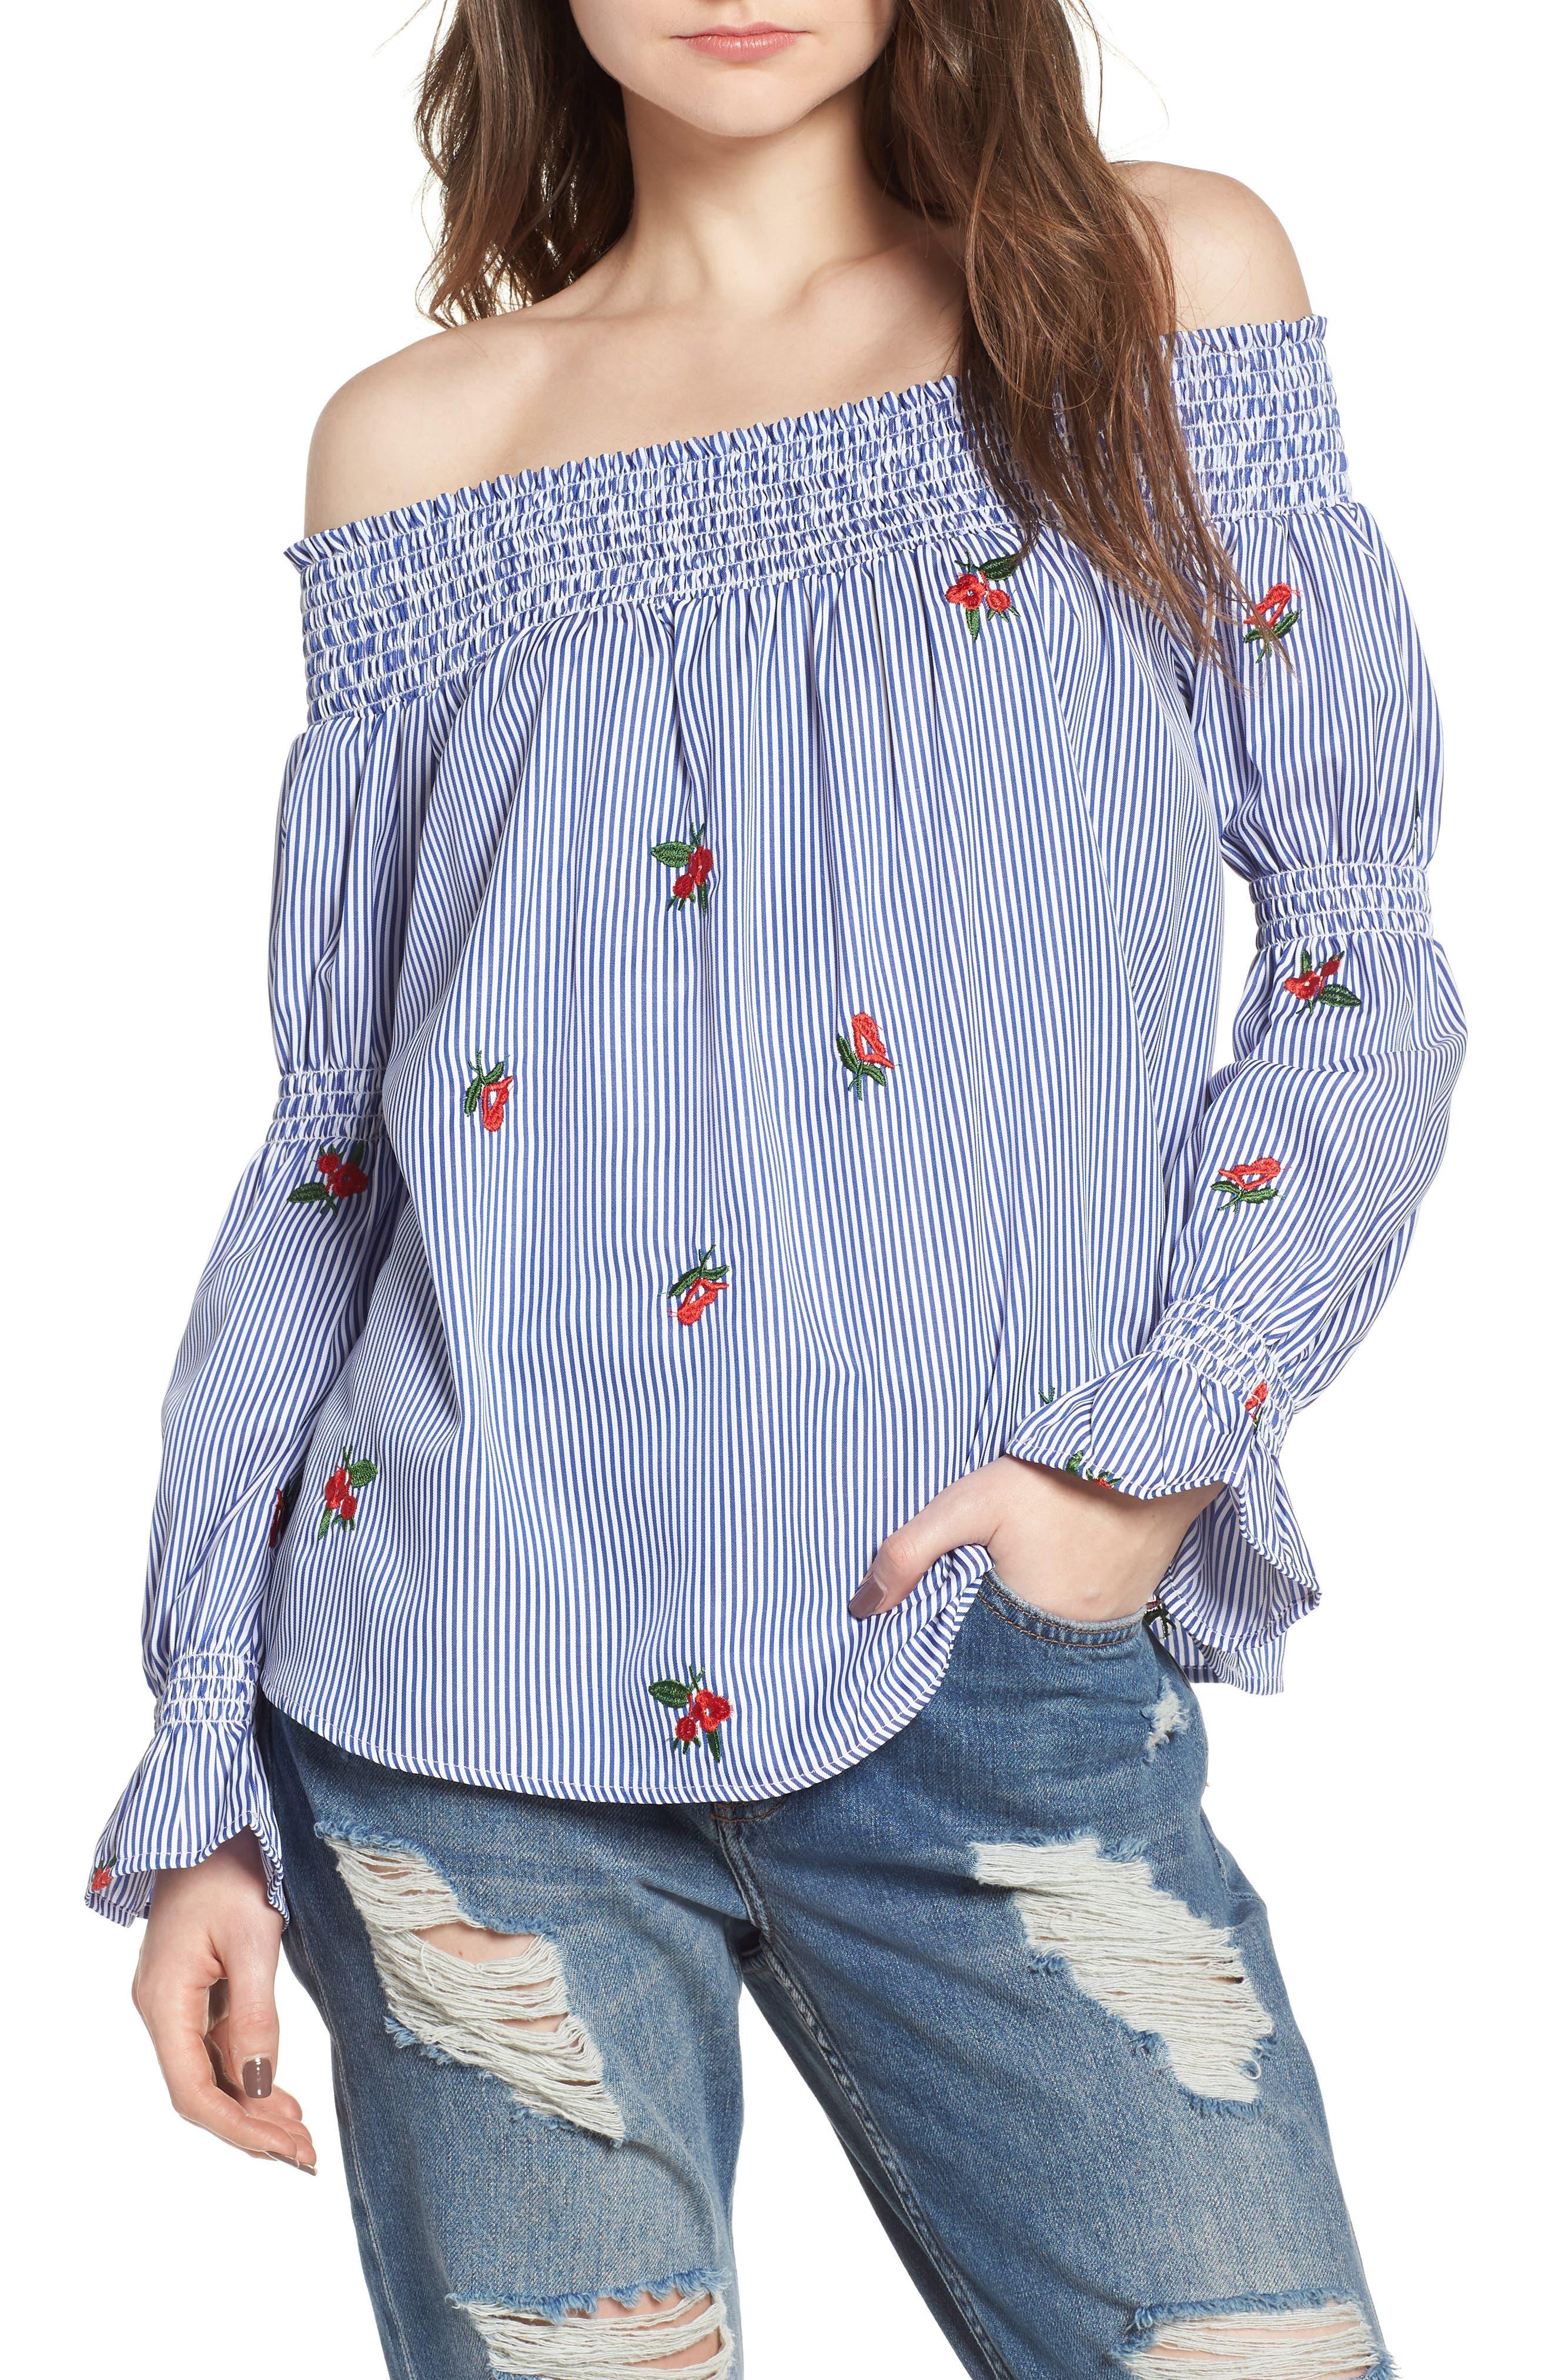 Soprano Floral Embroidered Stripe Off the Shoulder Top